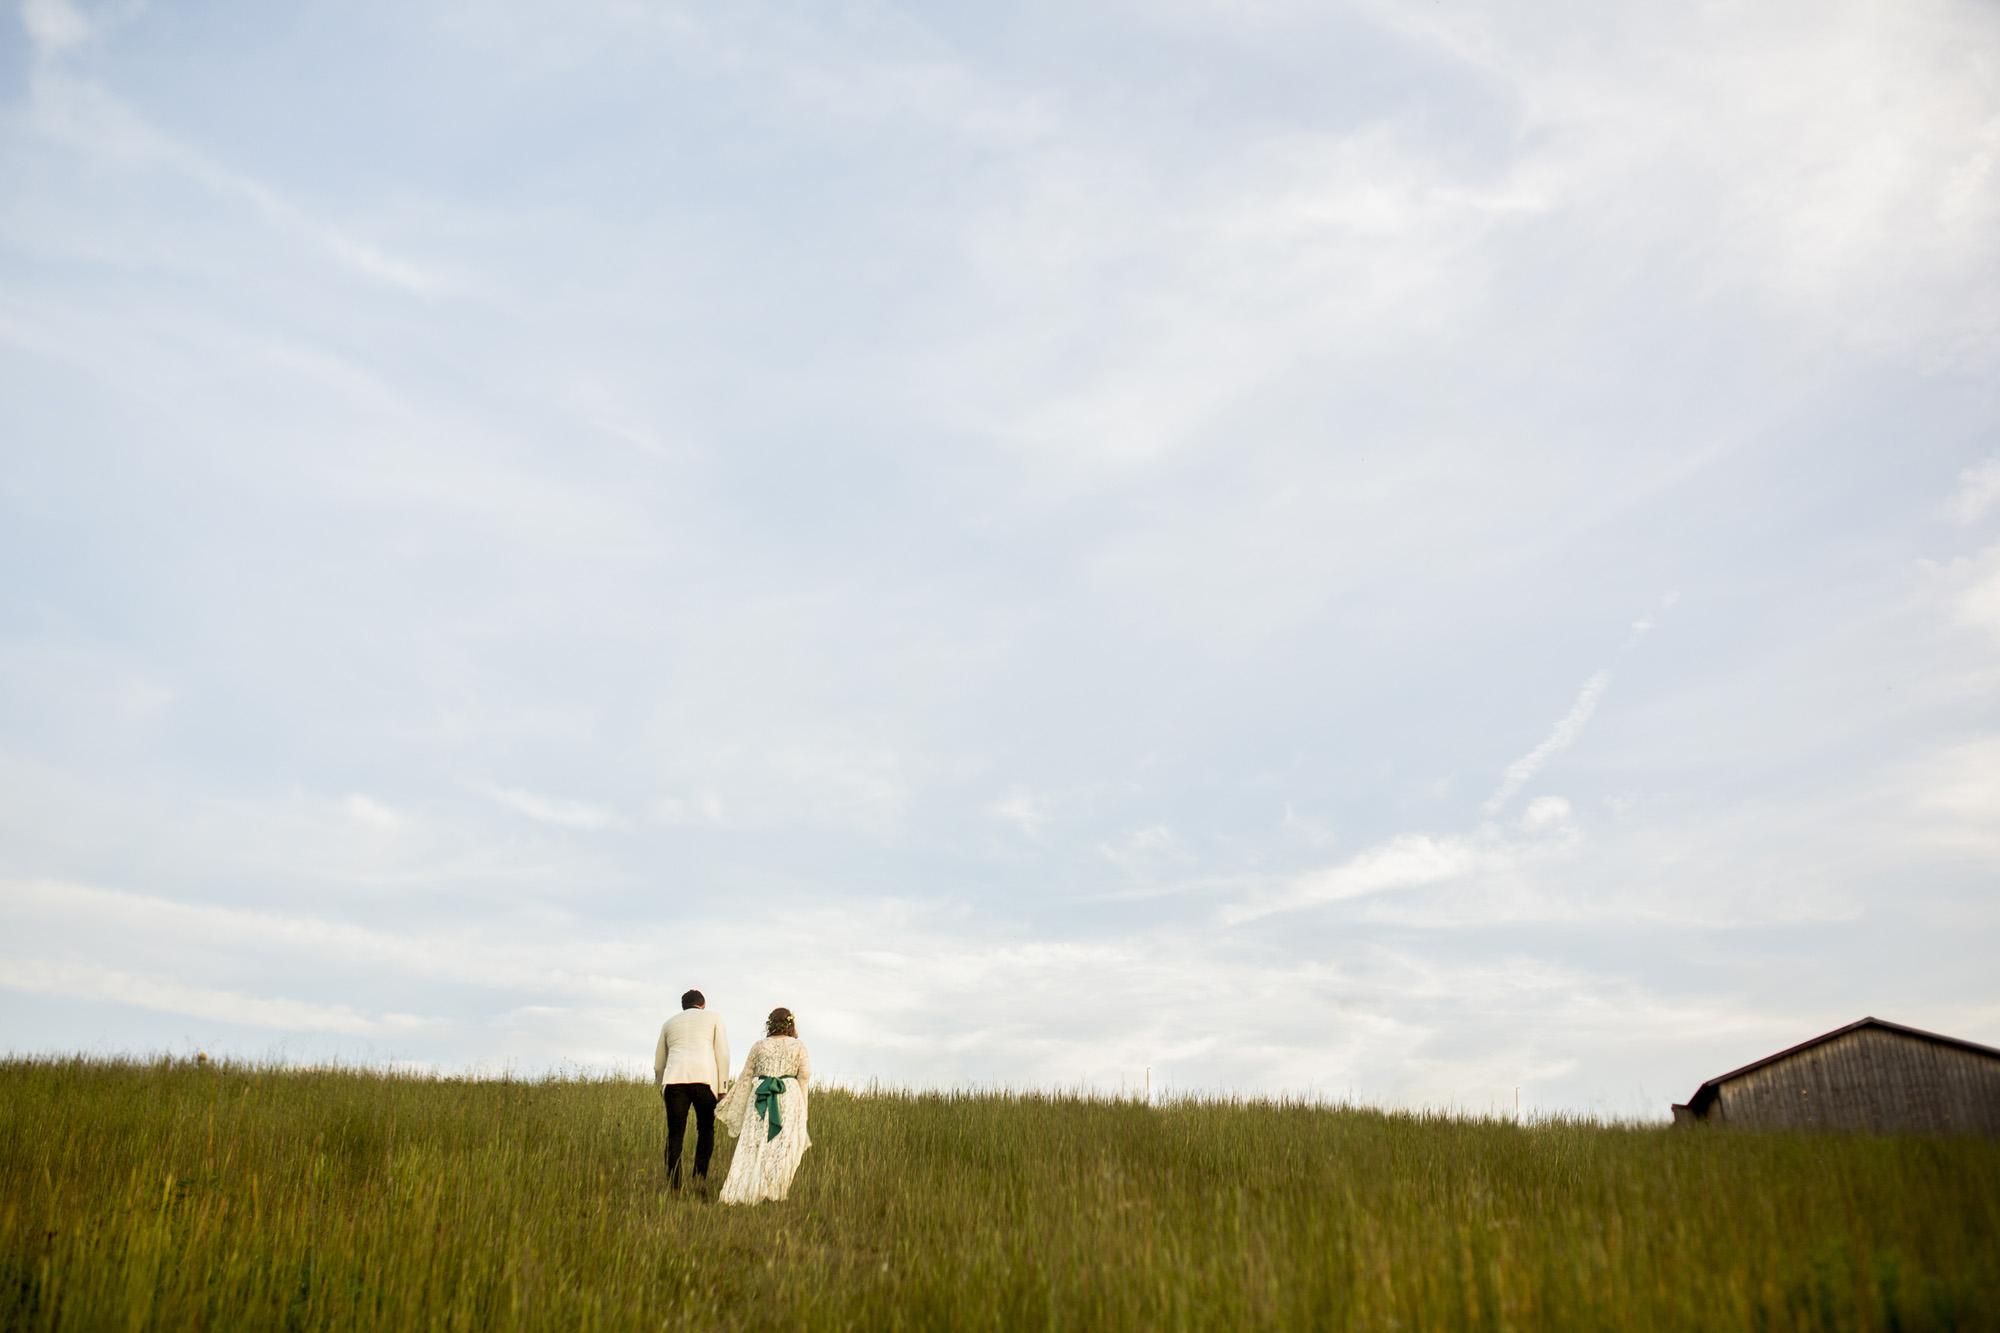 Seriously_Sabrina_Photography_Red_River_Gorge_Kentucky_Wedding_ShawnDana170.jpg